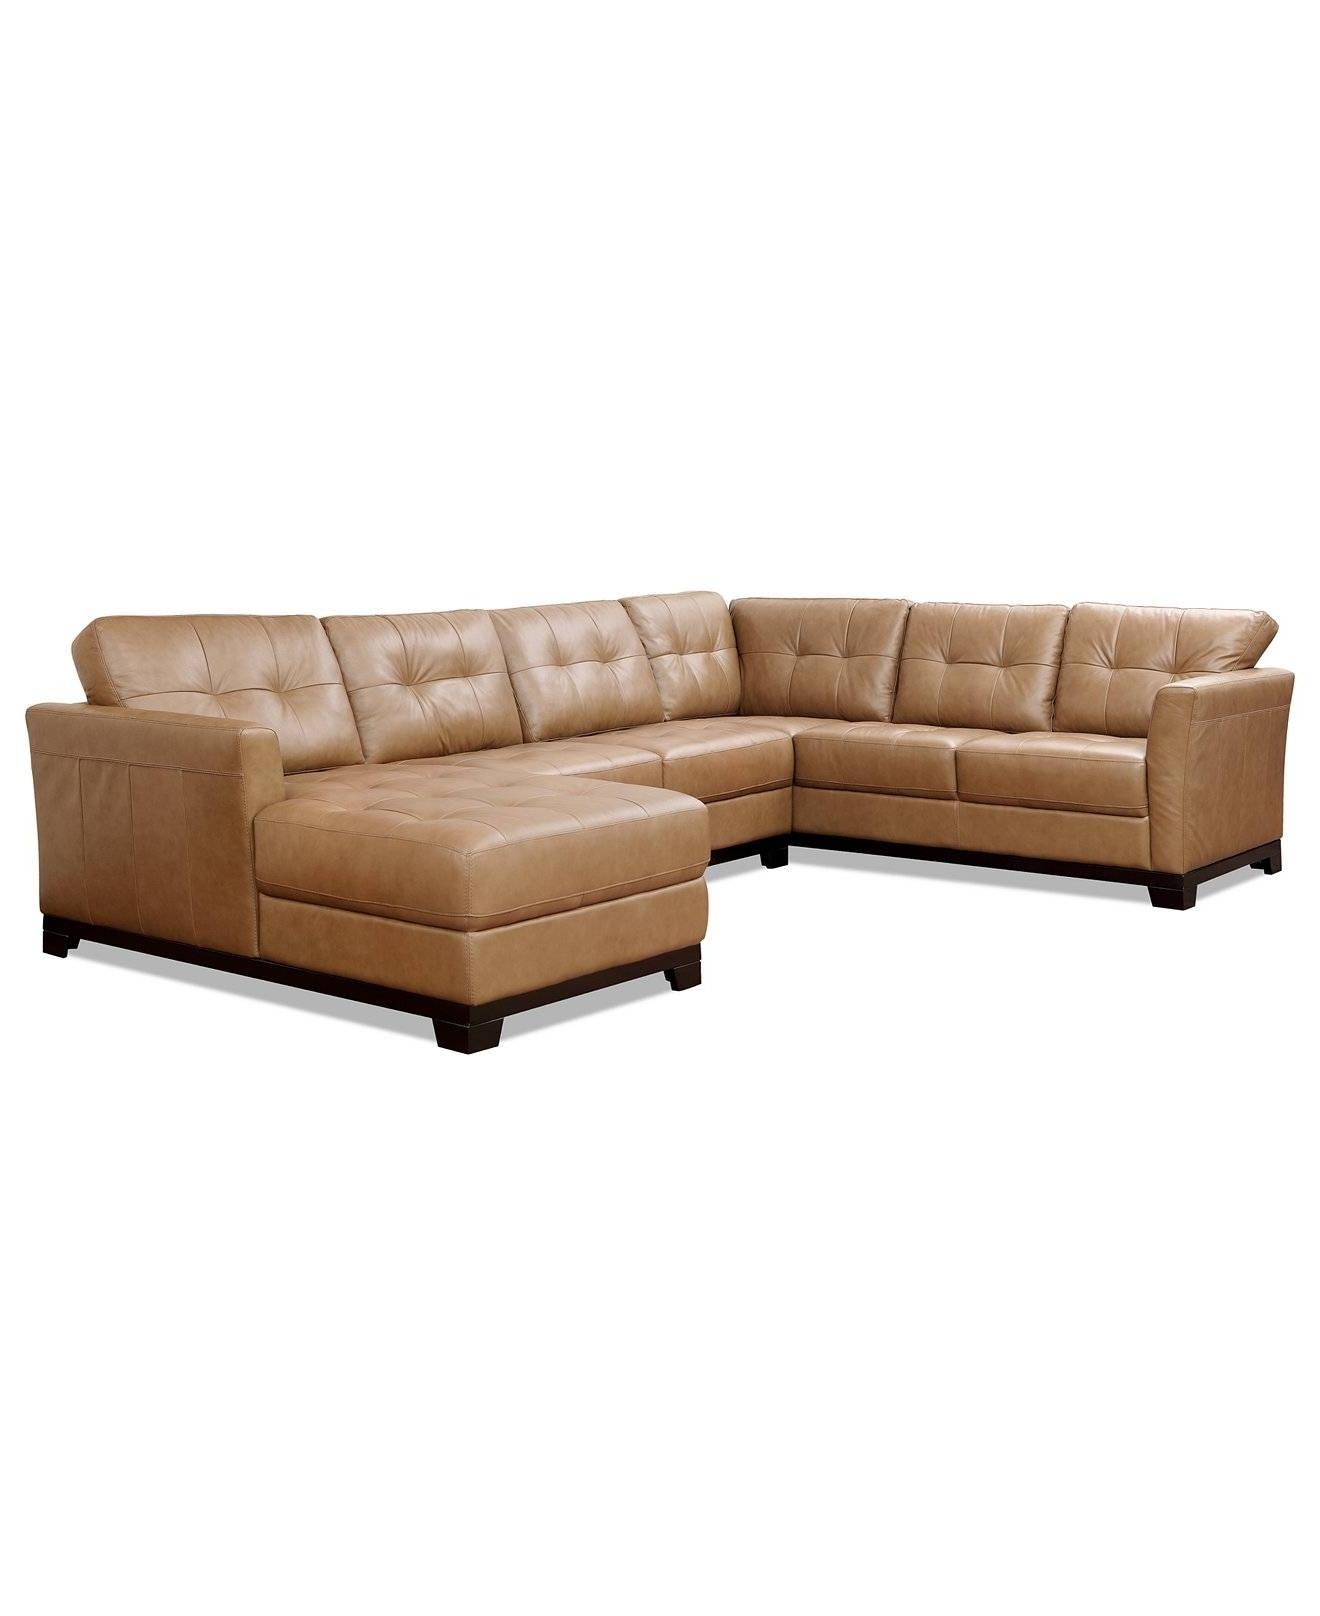 Macys Leather Sofas Regarding Recent Leather Sectional Sofa Macys • Leather Sofa (View 12 of 20)